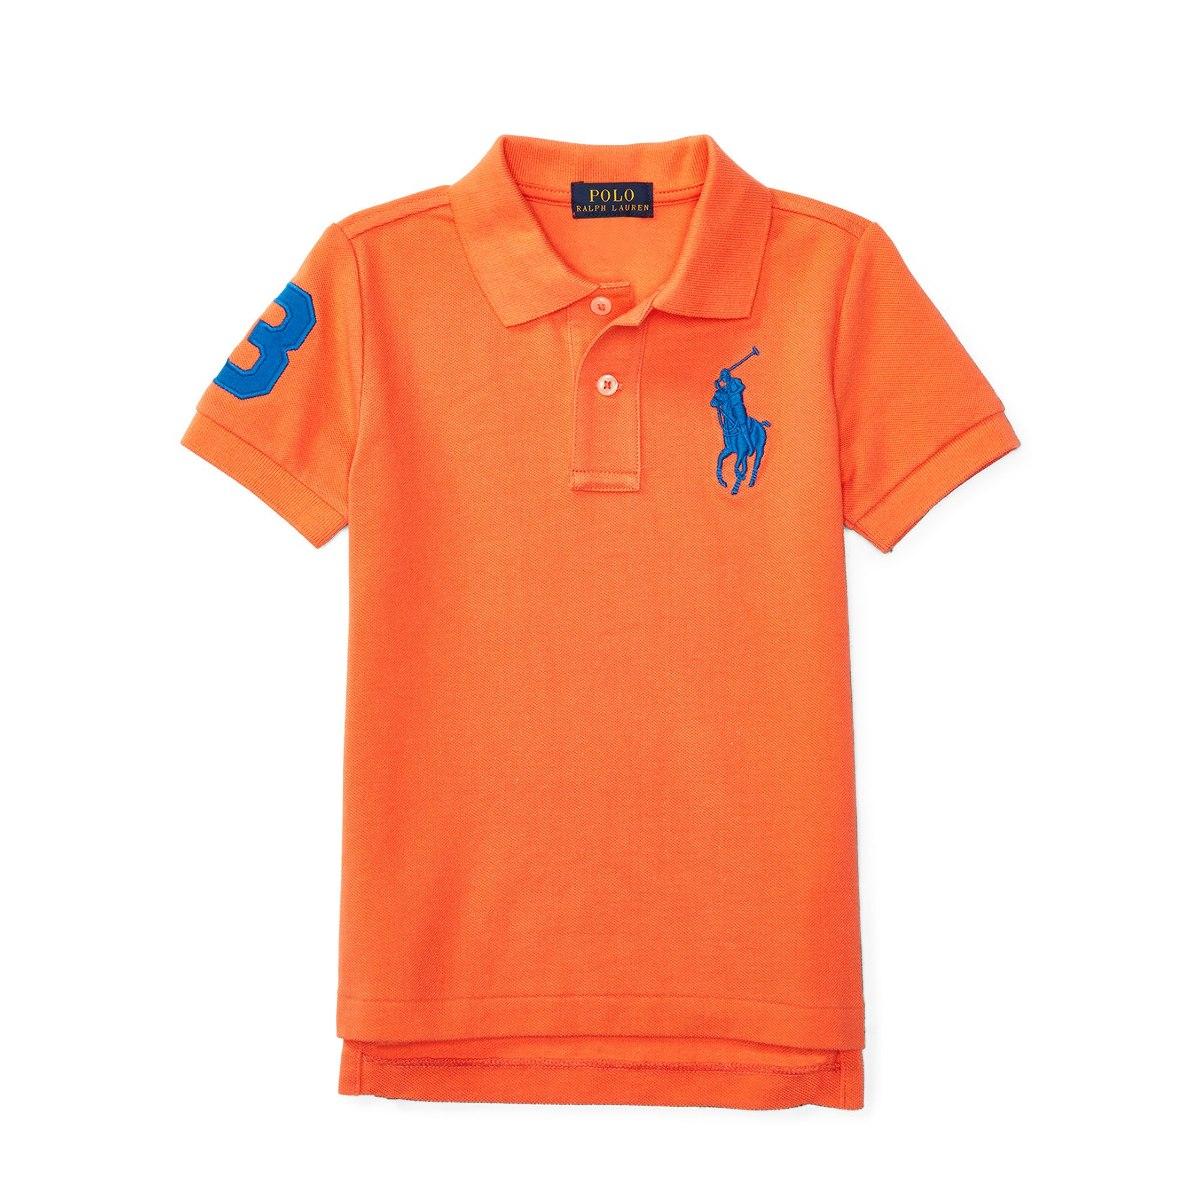 c980dee7d3 camisa infantil polo ralph lauren original 5t laranja. Carregando zoom.